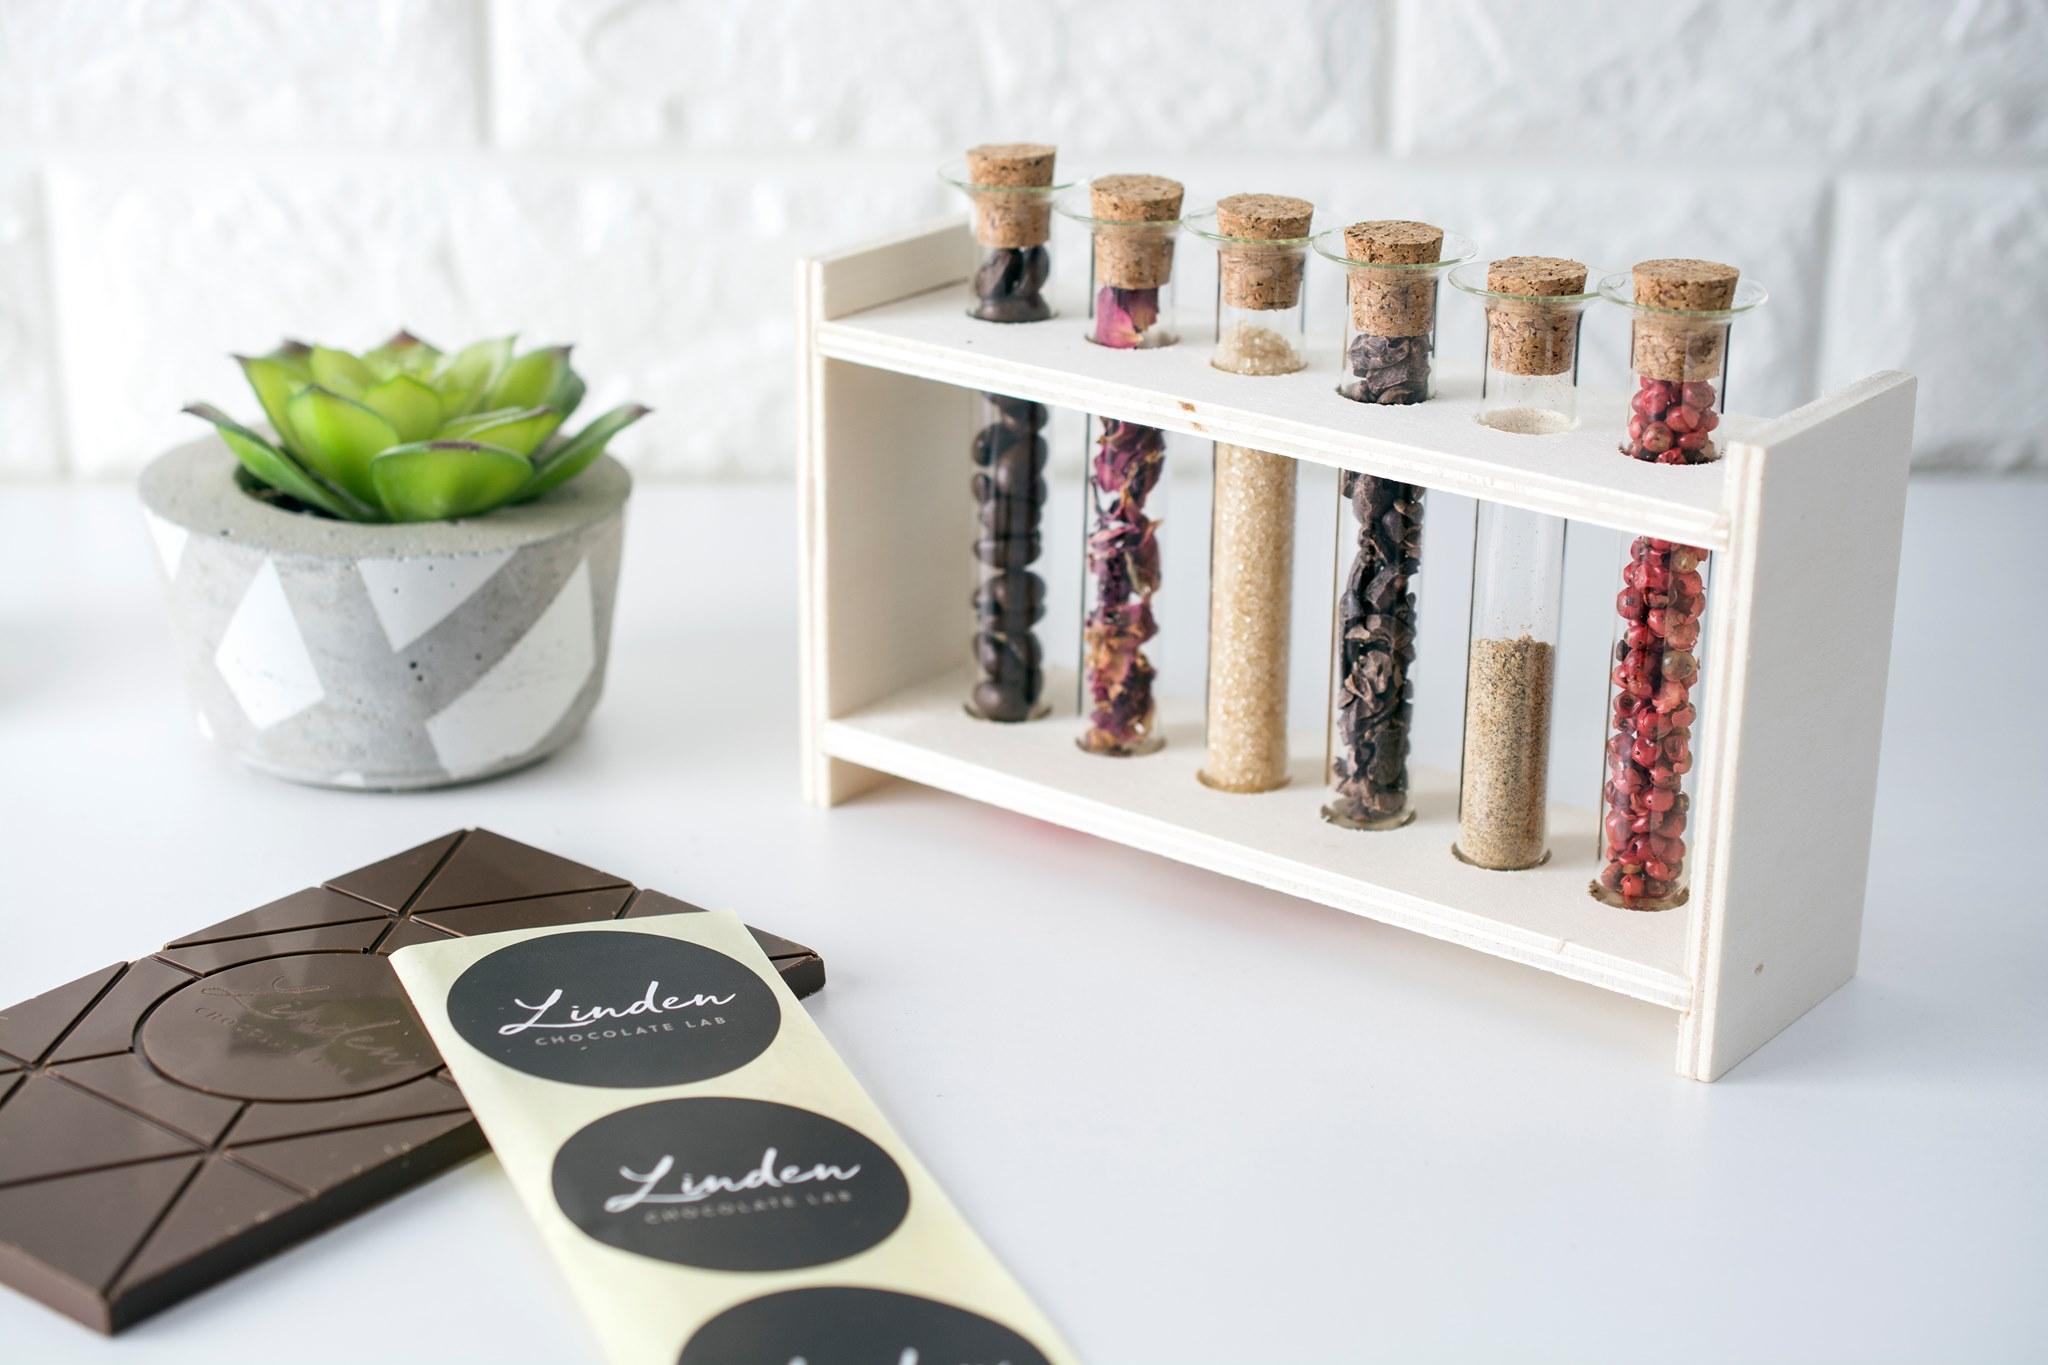 Linden Chocolate Lab